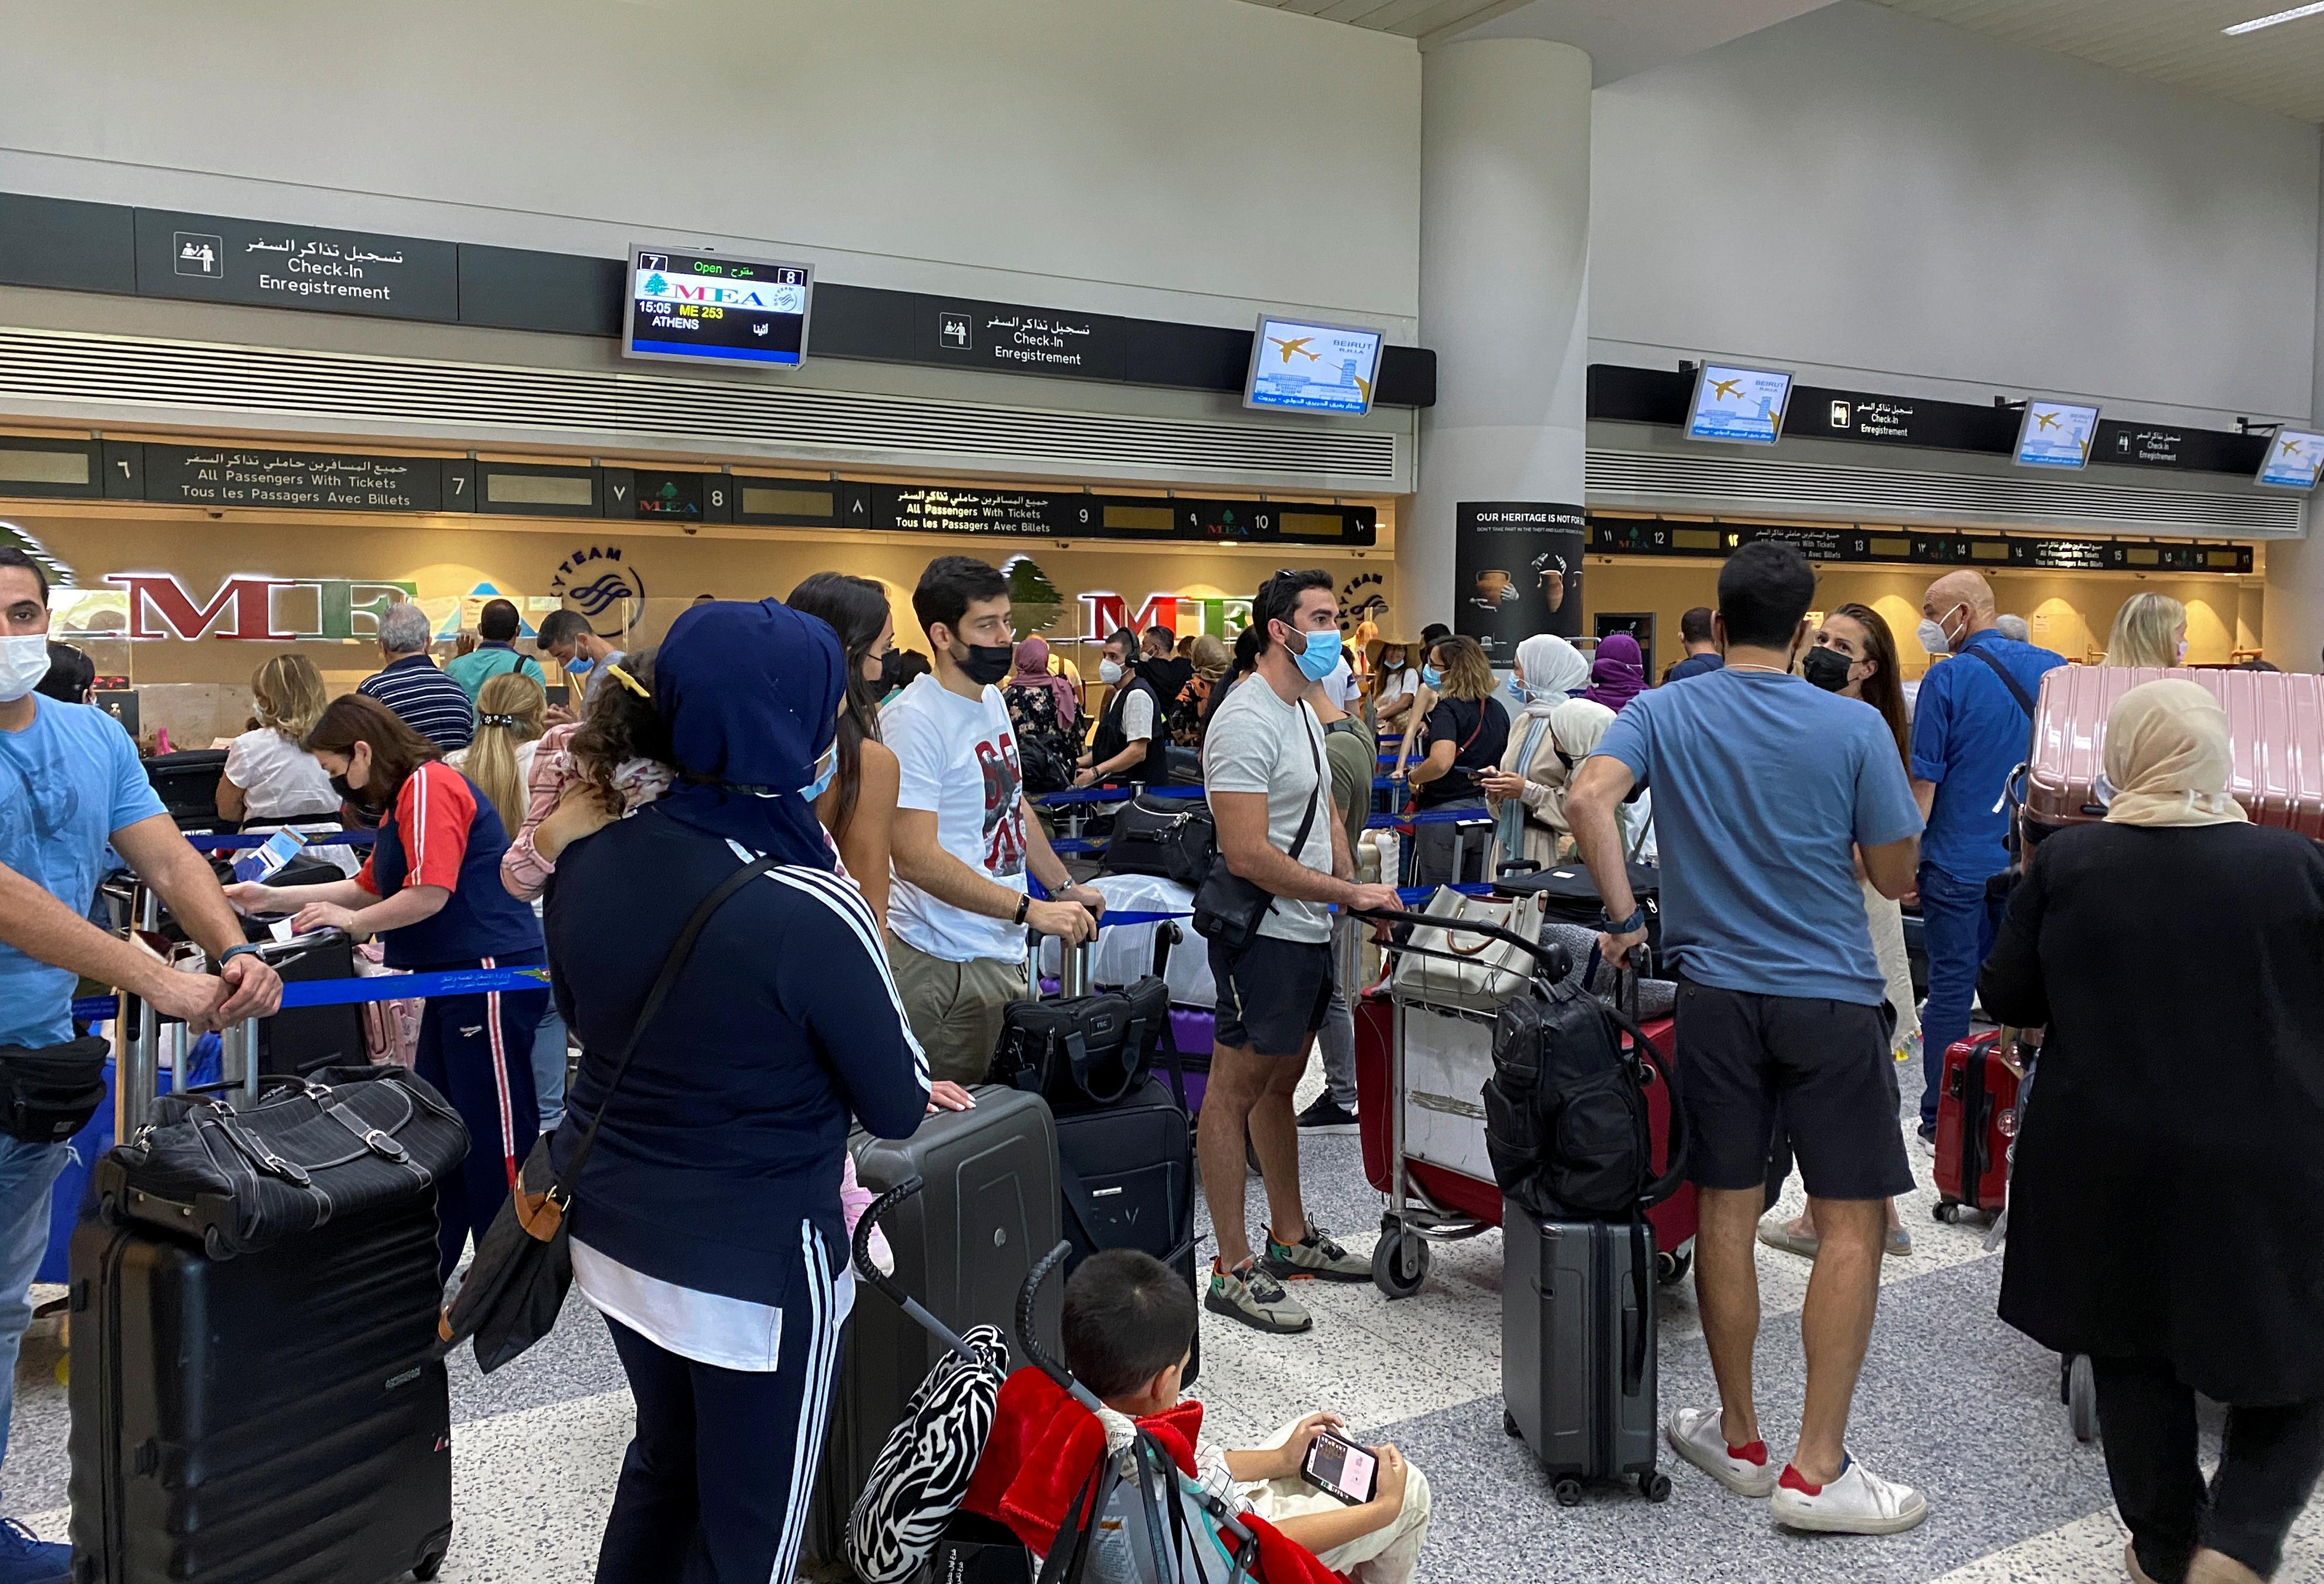 Passengers wait near check-in desks inside Beirut international airport, in Beirut, Lebanon, September 19, 2021. REUTERS/Imad Creidi